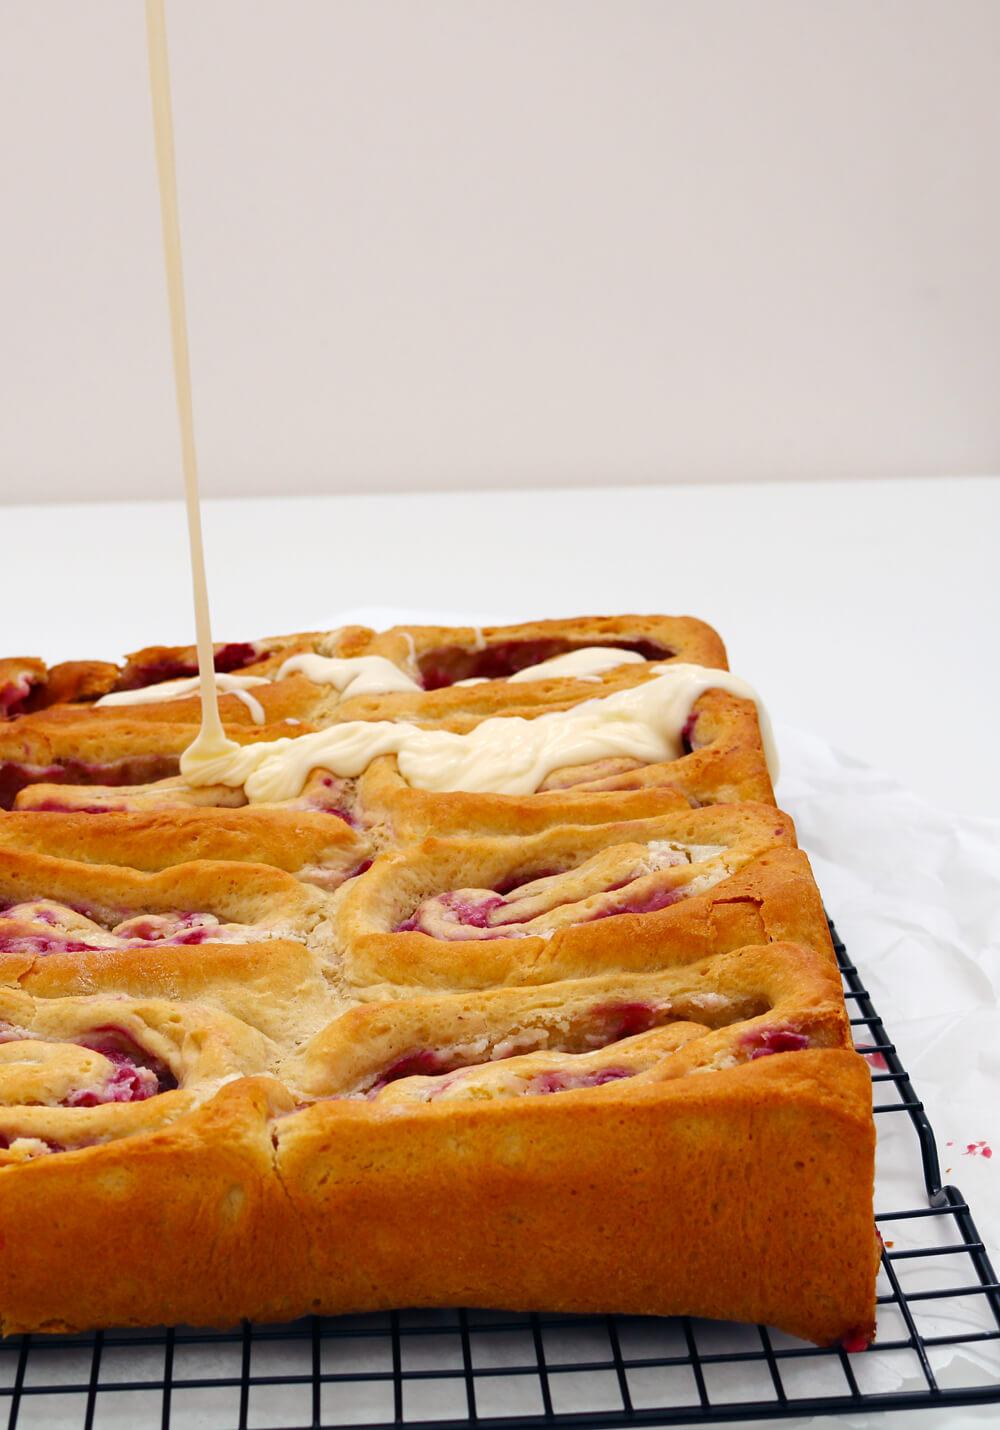 Raspberry Cheesecake Buns | Bake Off Bake Along | Take Some Whisks